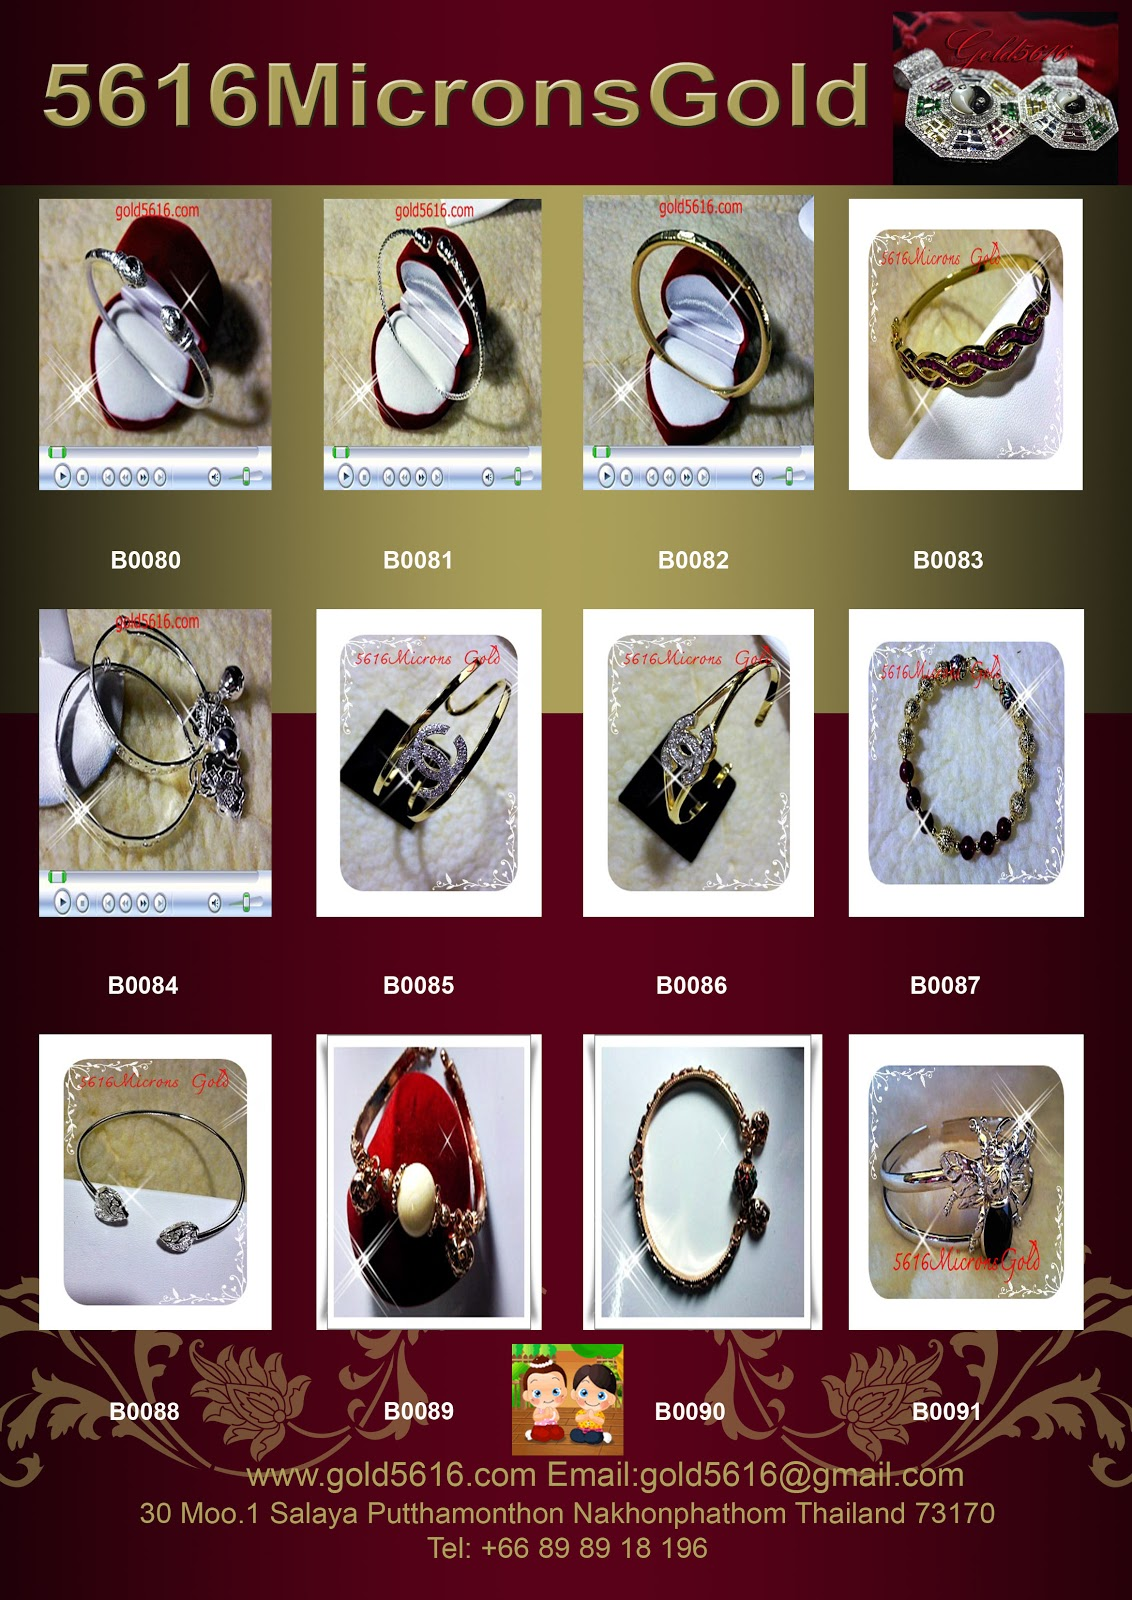 Inspire jewelry code b0001 b0103 for Code postal charmes